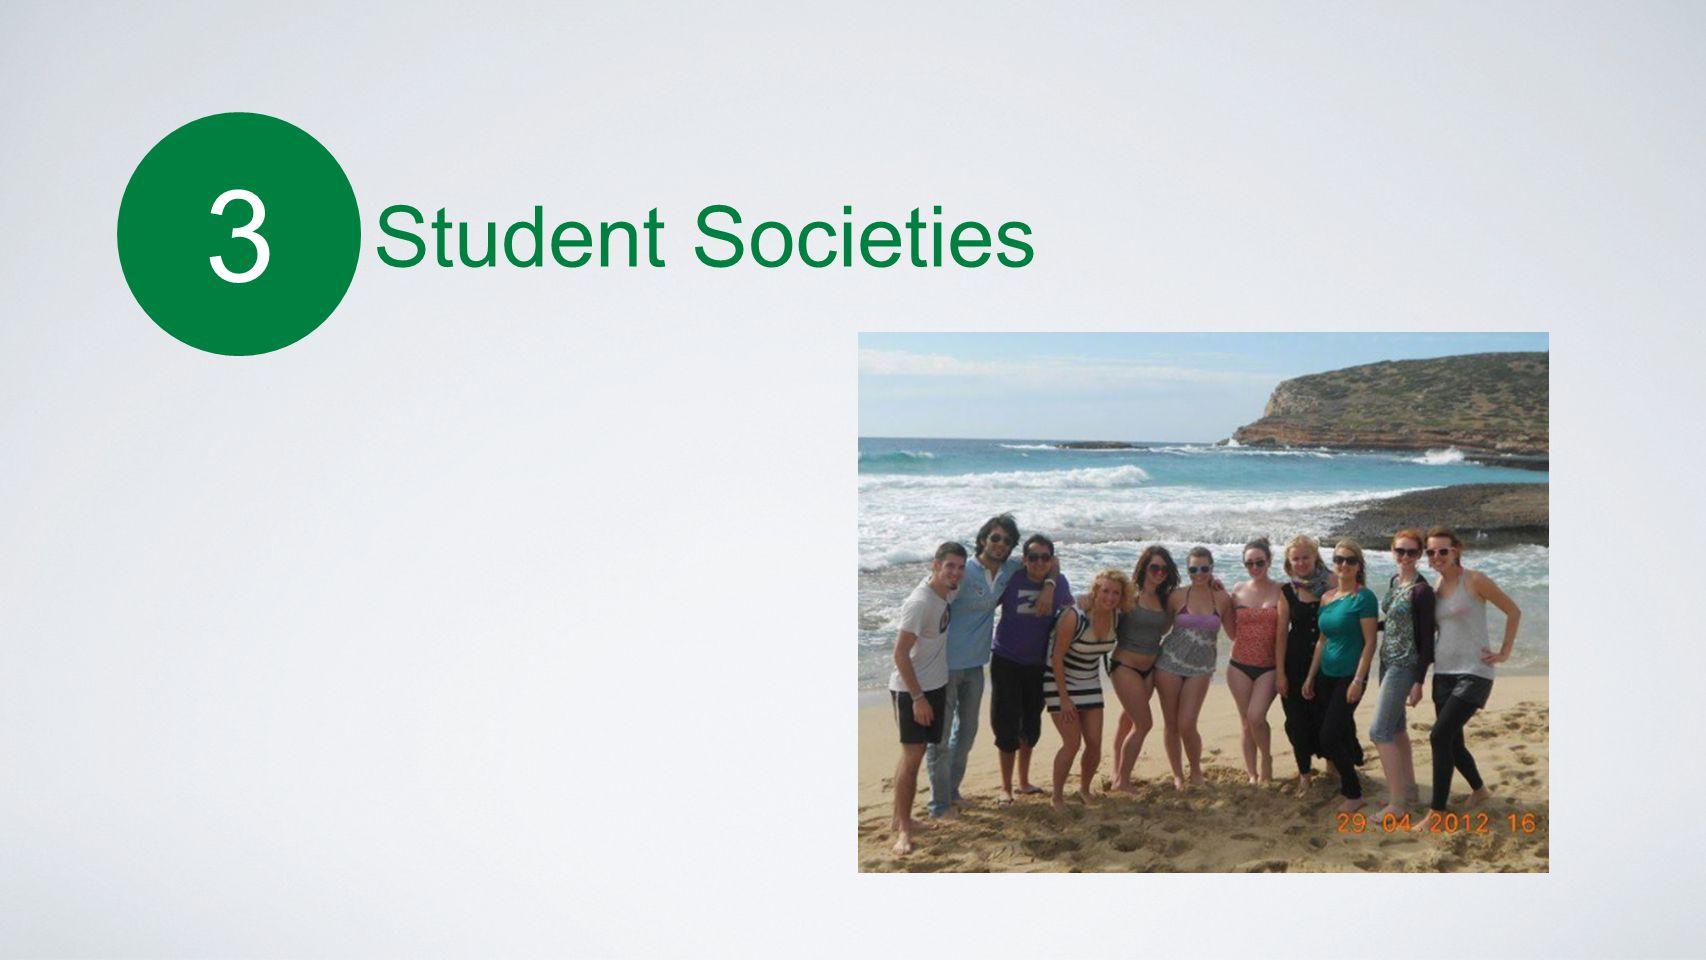 3 Student Societies